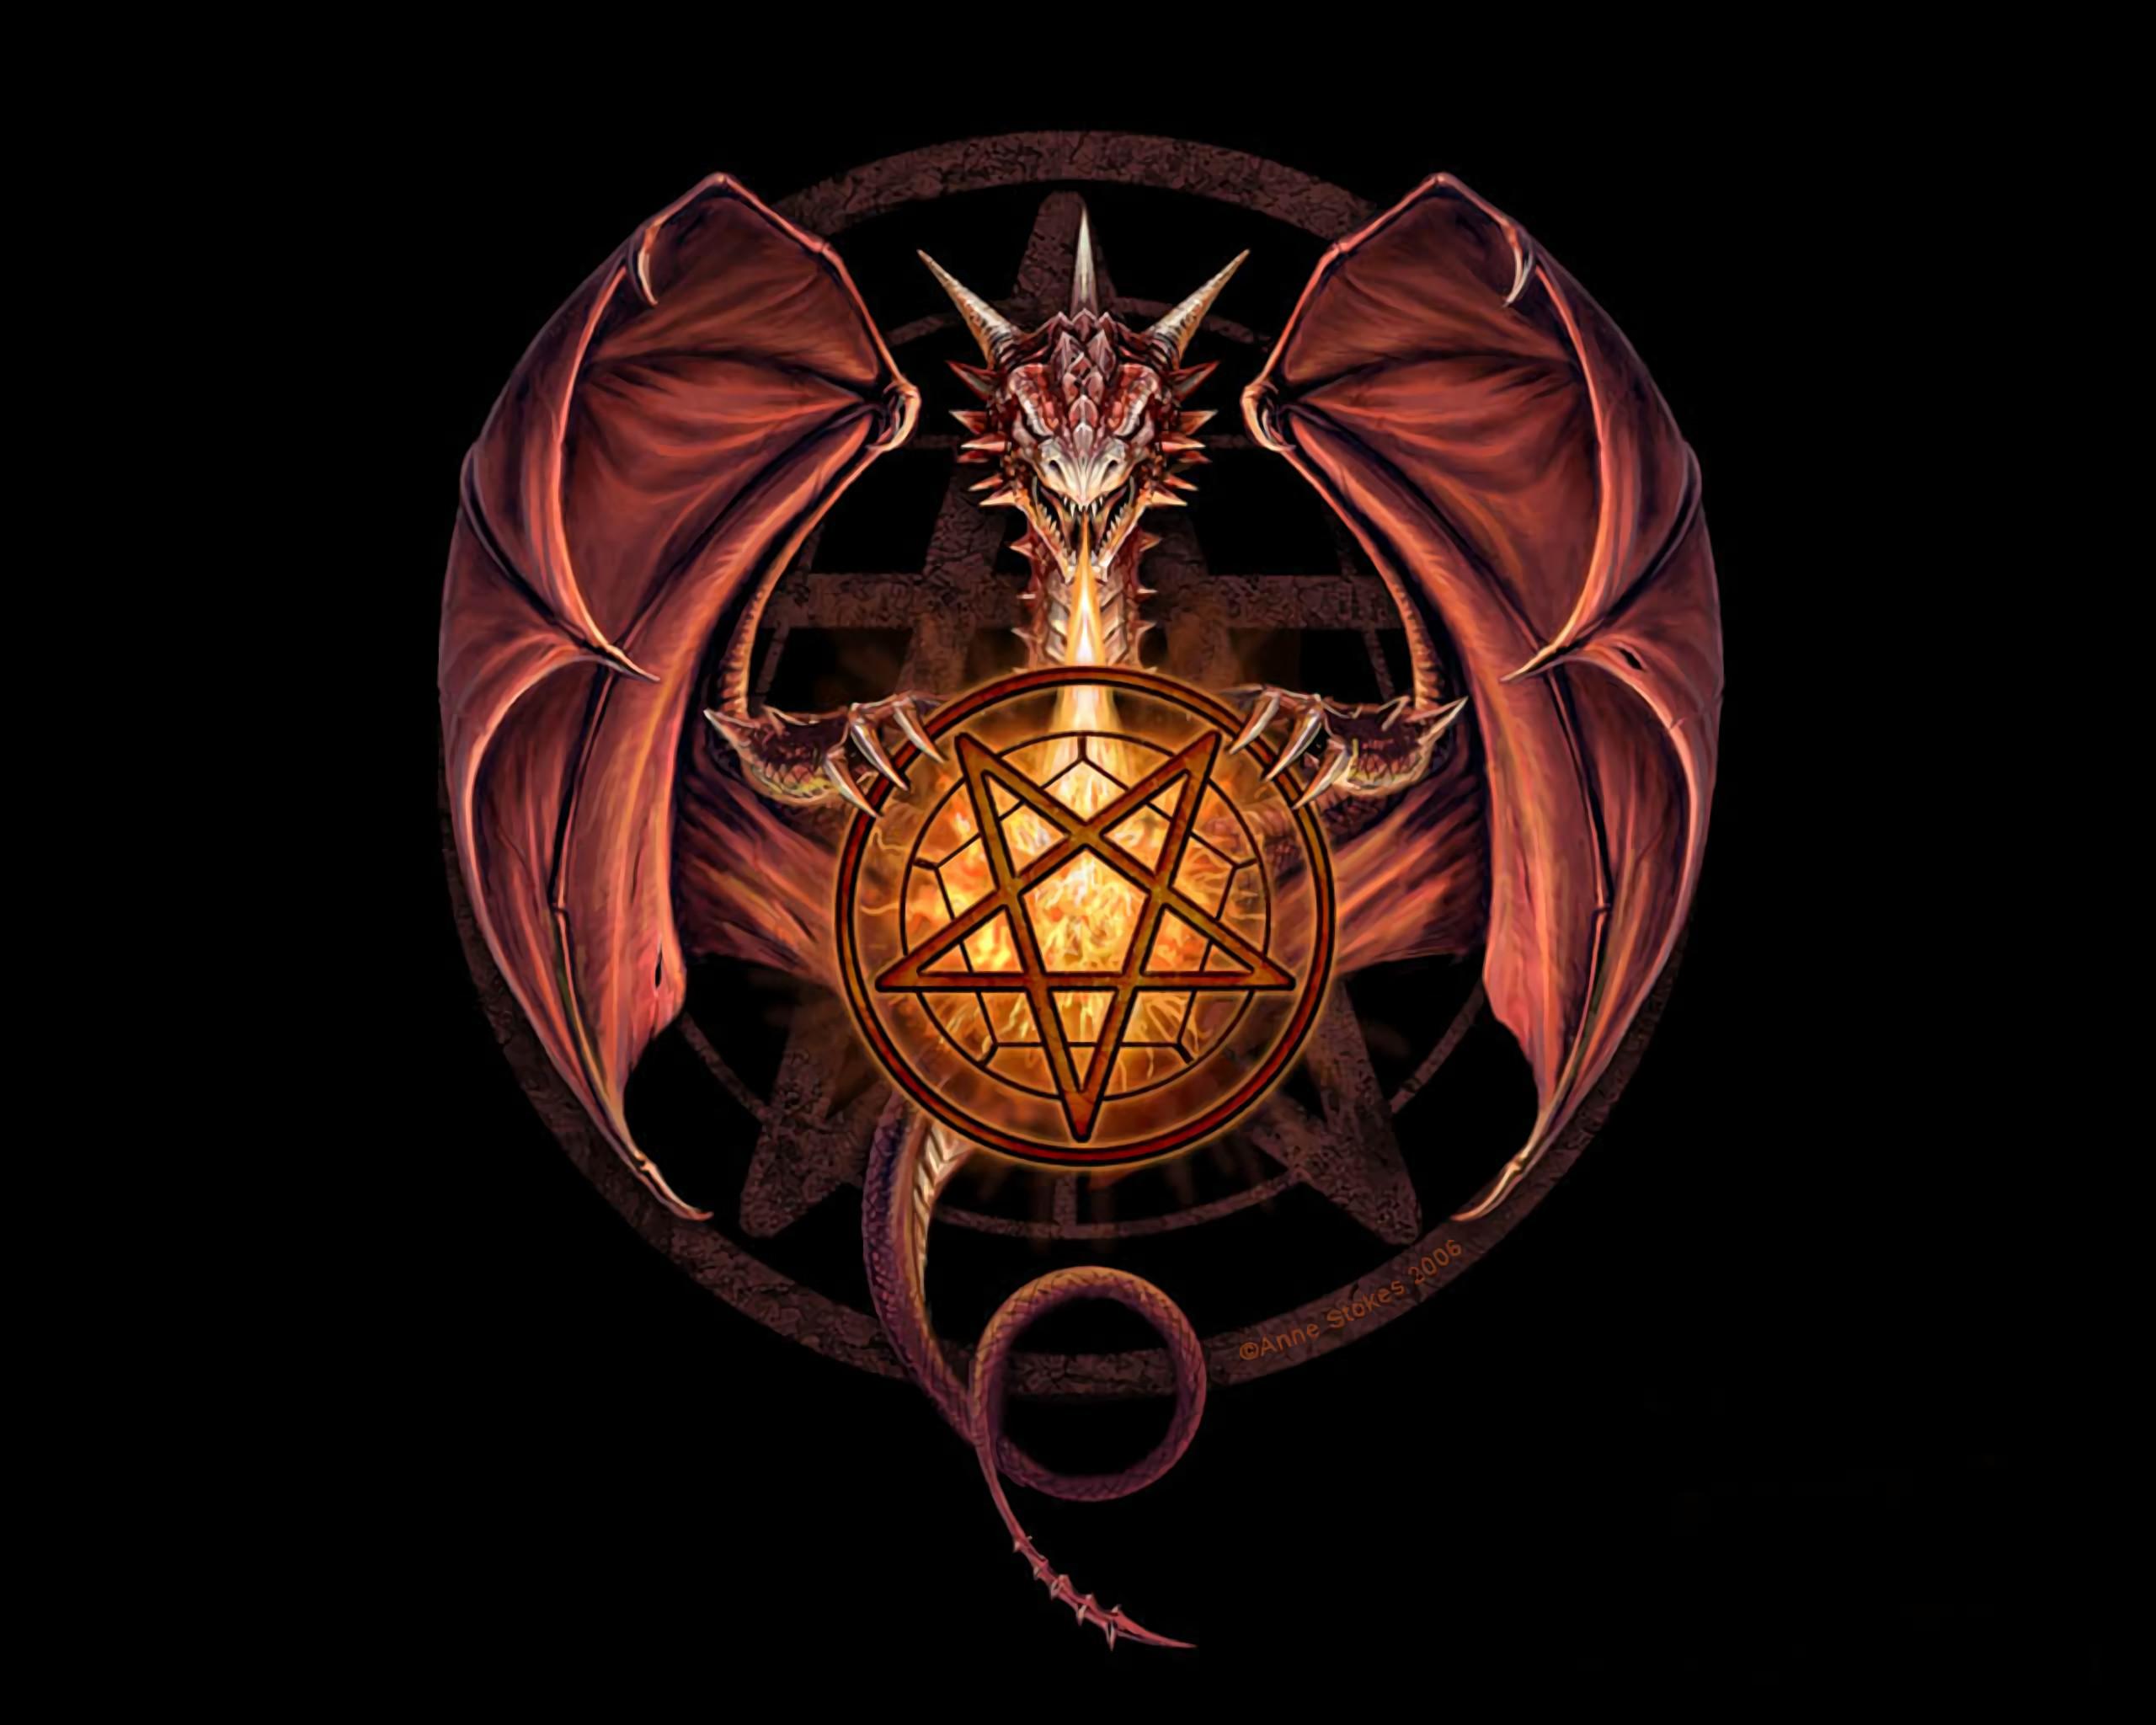 Wicca Wallpaper 183 ① Wallpapertag